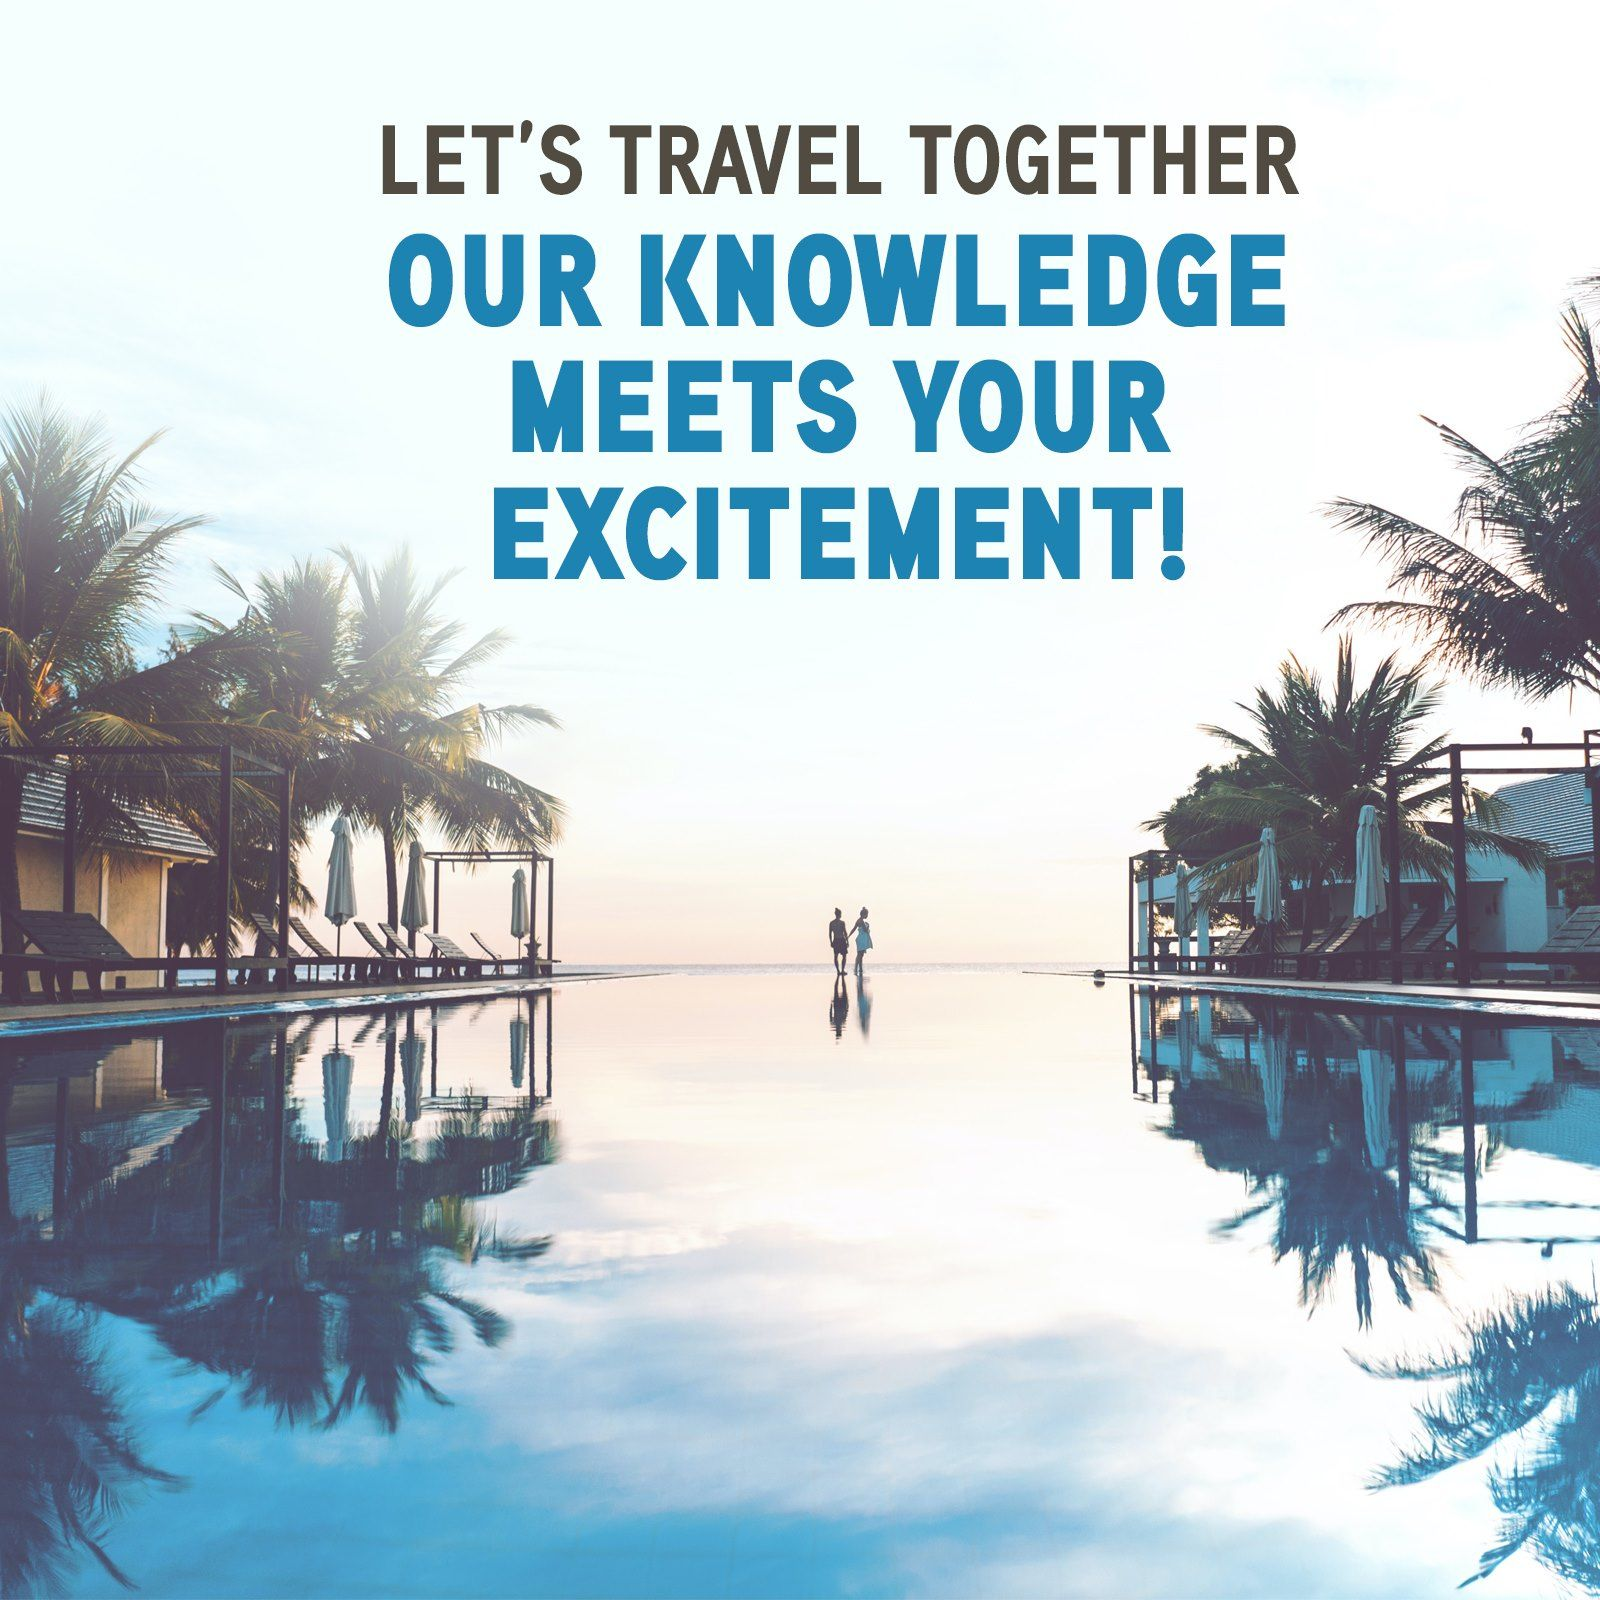 www.facebook.com/rebeccaadebeachgirltravel/ www.beachgirltravel.com  #beachgirltravel #smallbusiness # #travelexpert #distinctvacations #winetravel #rivercruise #luxurycruise #grouptravel #honeymoons #familyvacations #familyreunions #foodietravel #travelagency #luxurytraveladvisor #budgettravel #traveldeals